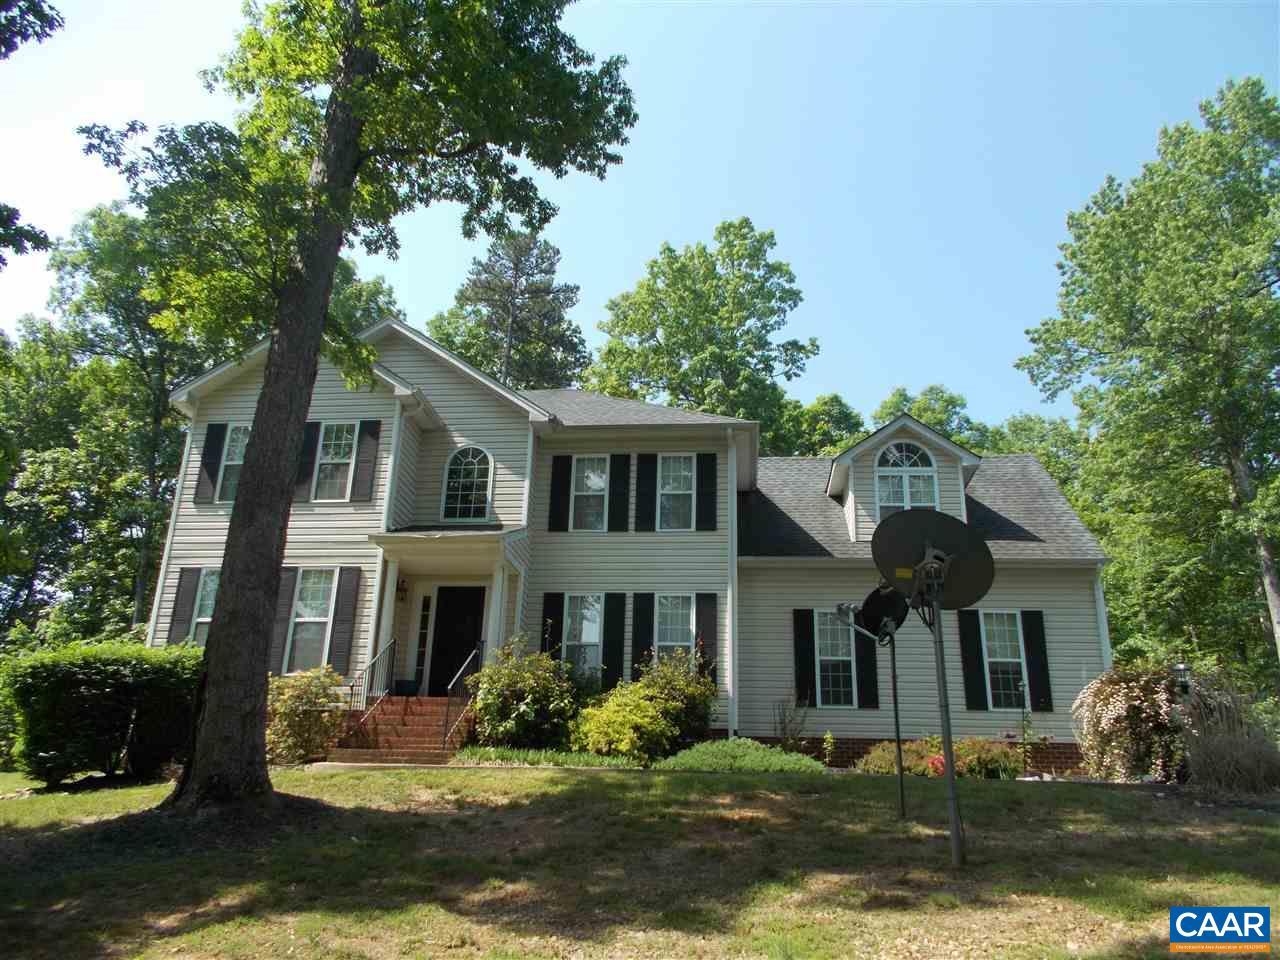 home for sale , MLS #576388, 193 Richardson Dr